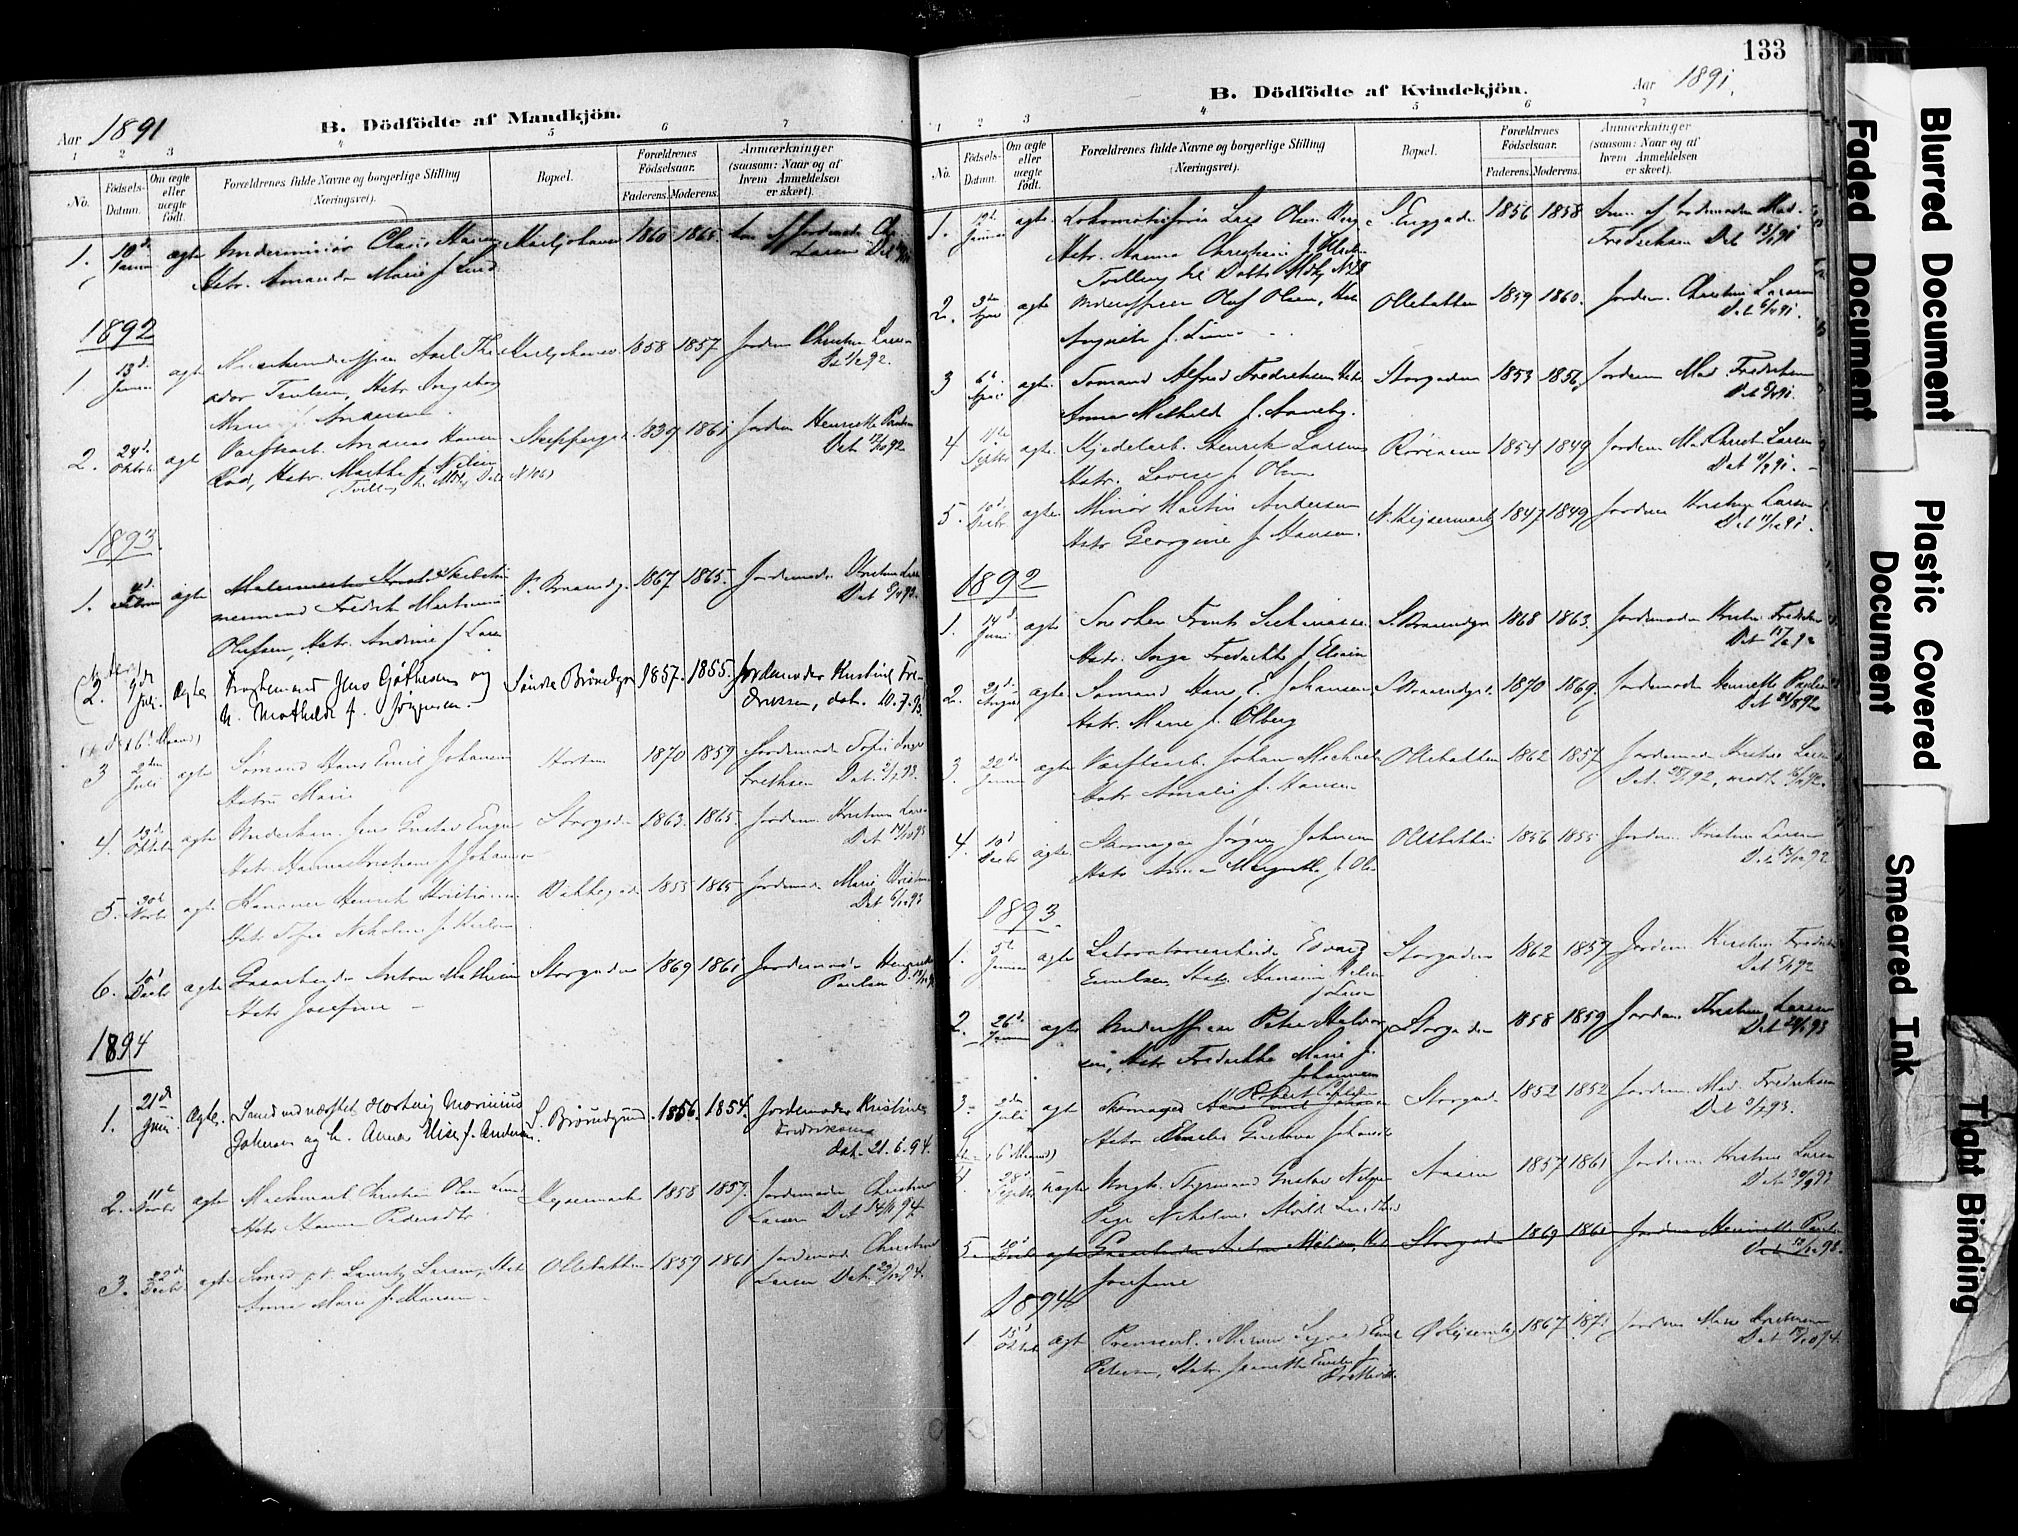 SAKO, Horten kirkebøker, F/Fa/L0004: Parish register (official) no. 4, 1888-1895, p. 133